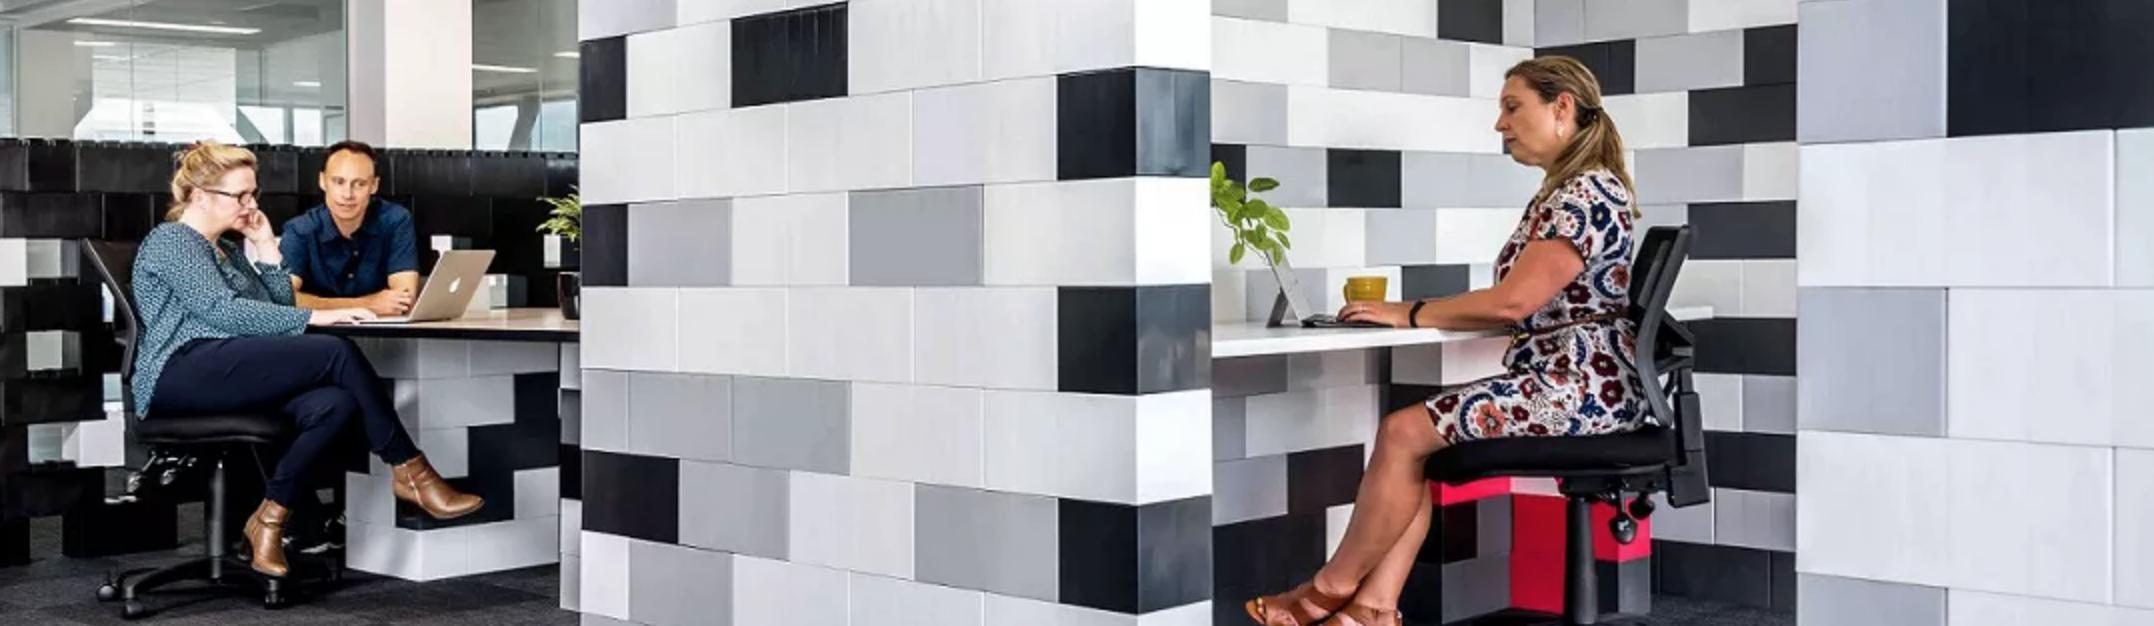 modular building blocks office design